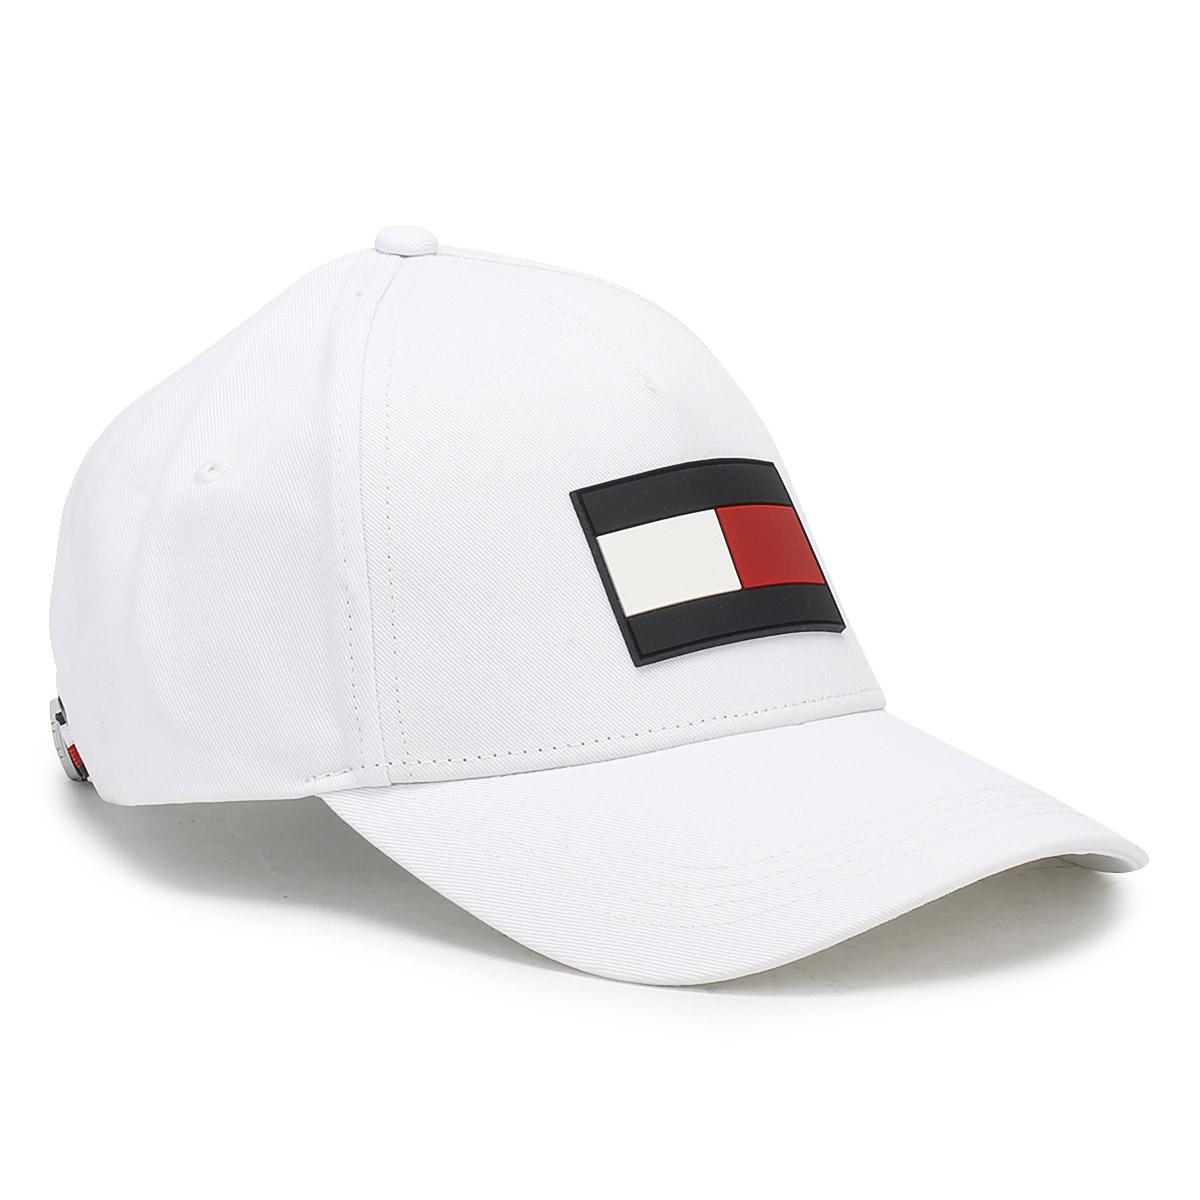 Colour-Blocked Flag Cap - Sales Up to -50% Tommy Hilfiger scZmkjy3g5